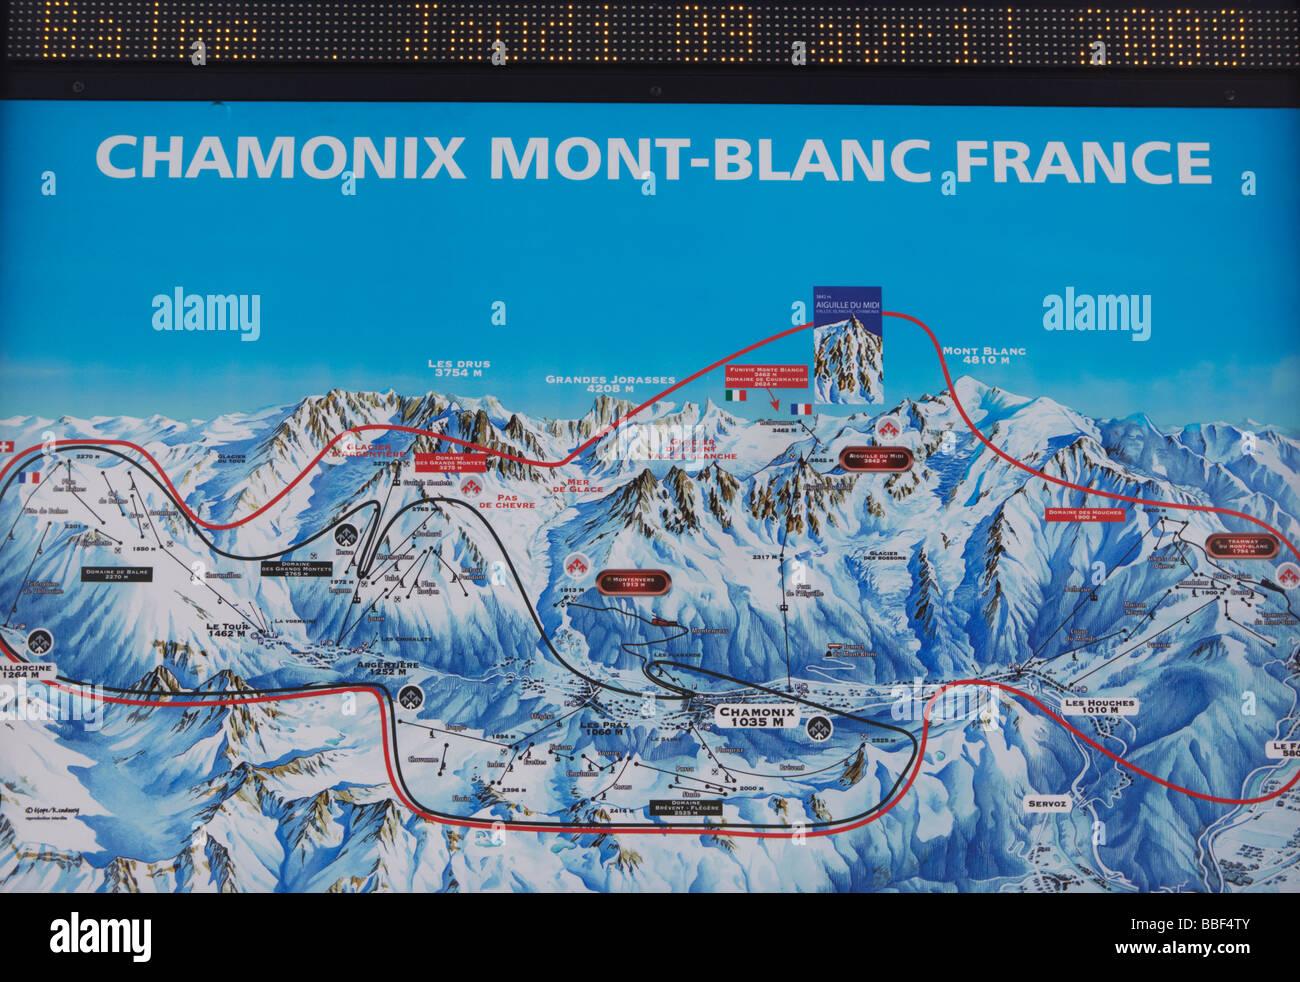 Chamonix Cartina Geografica.Mappa Piste Per Chamonix Mont Blanc Sulle Alpi Francesi Francia Europa Foto Stock Alamy